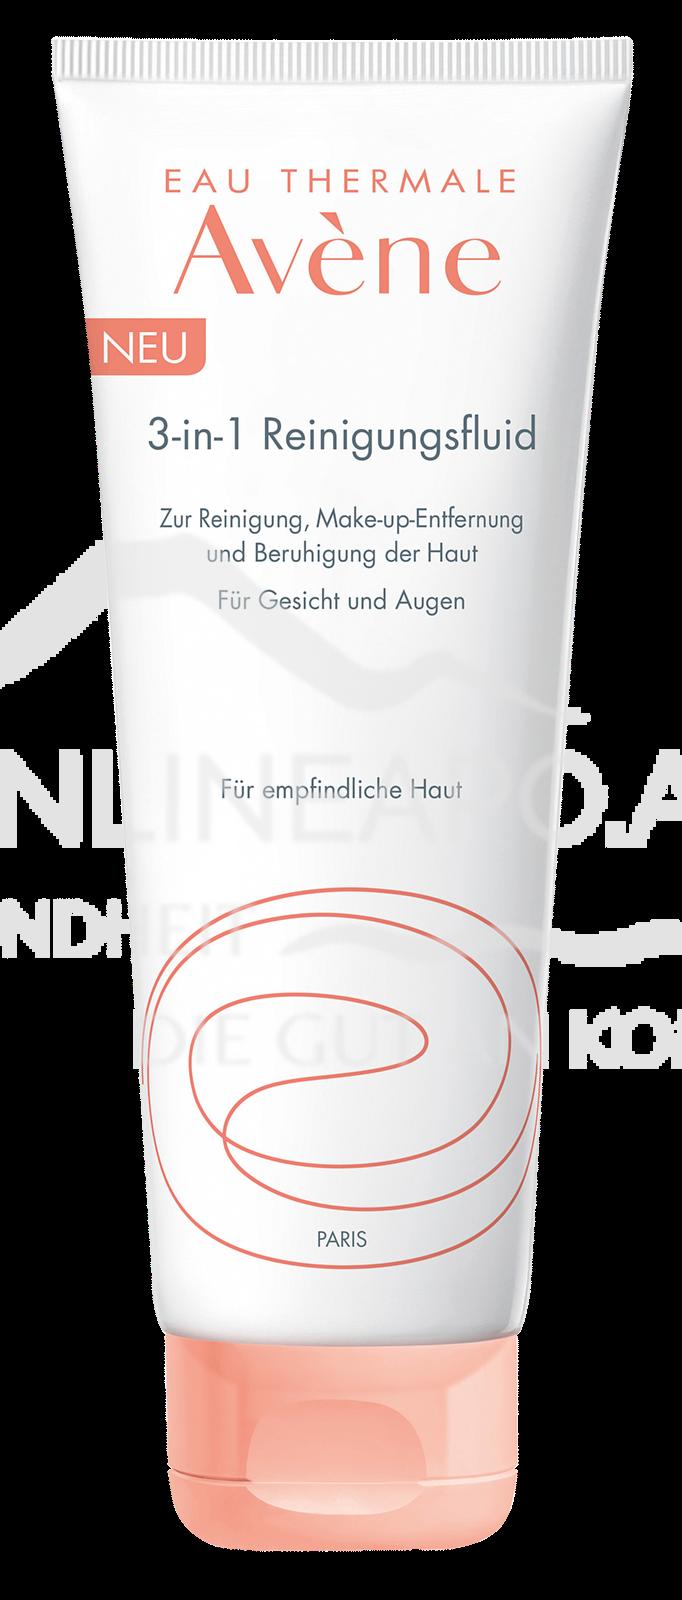 Avène 3-in-1 Reinigungsfluid